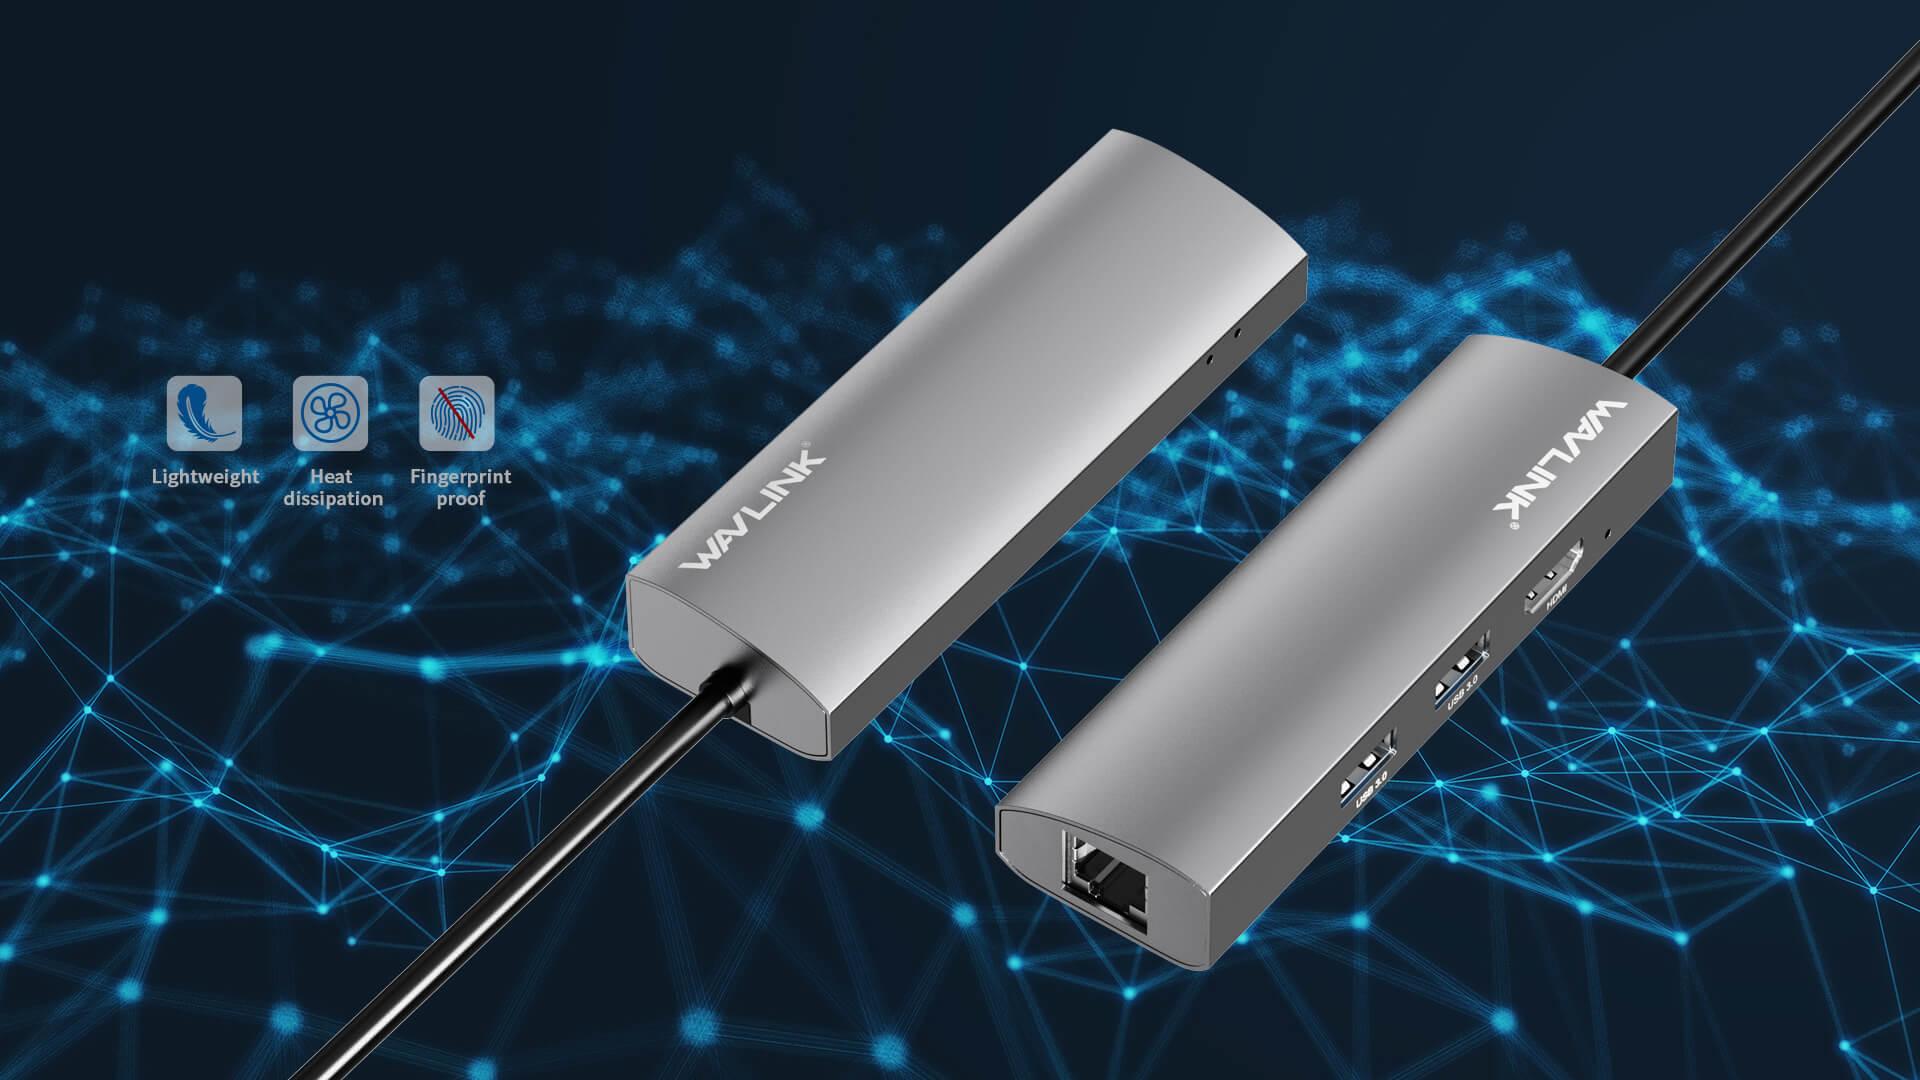 WAVLINK USB-C 3.1 TRAVELLING MINI DOCK WITH GIGABIT ETHERNET pc4 7